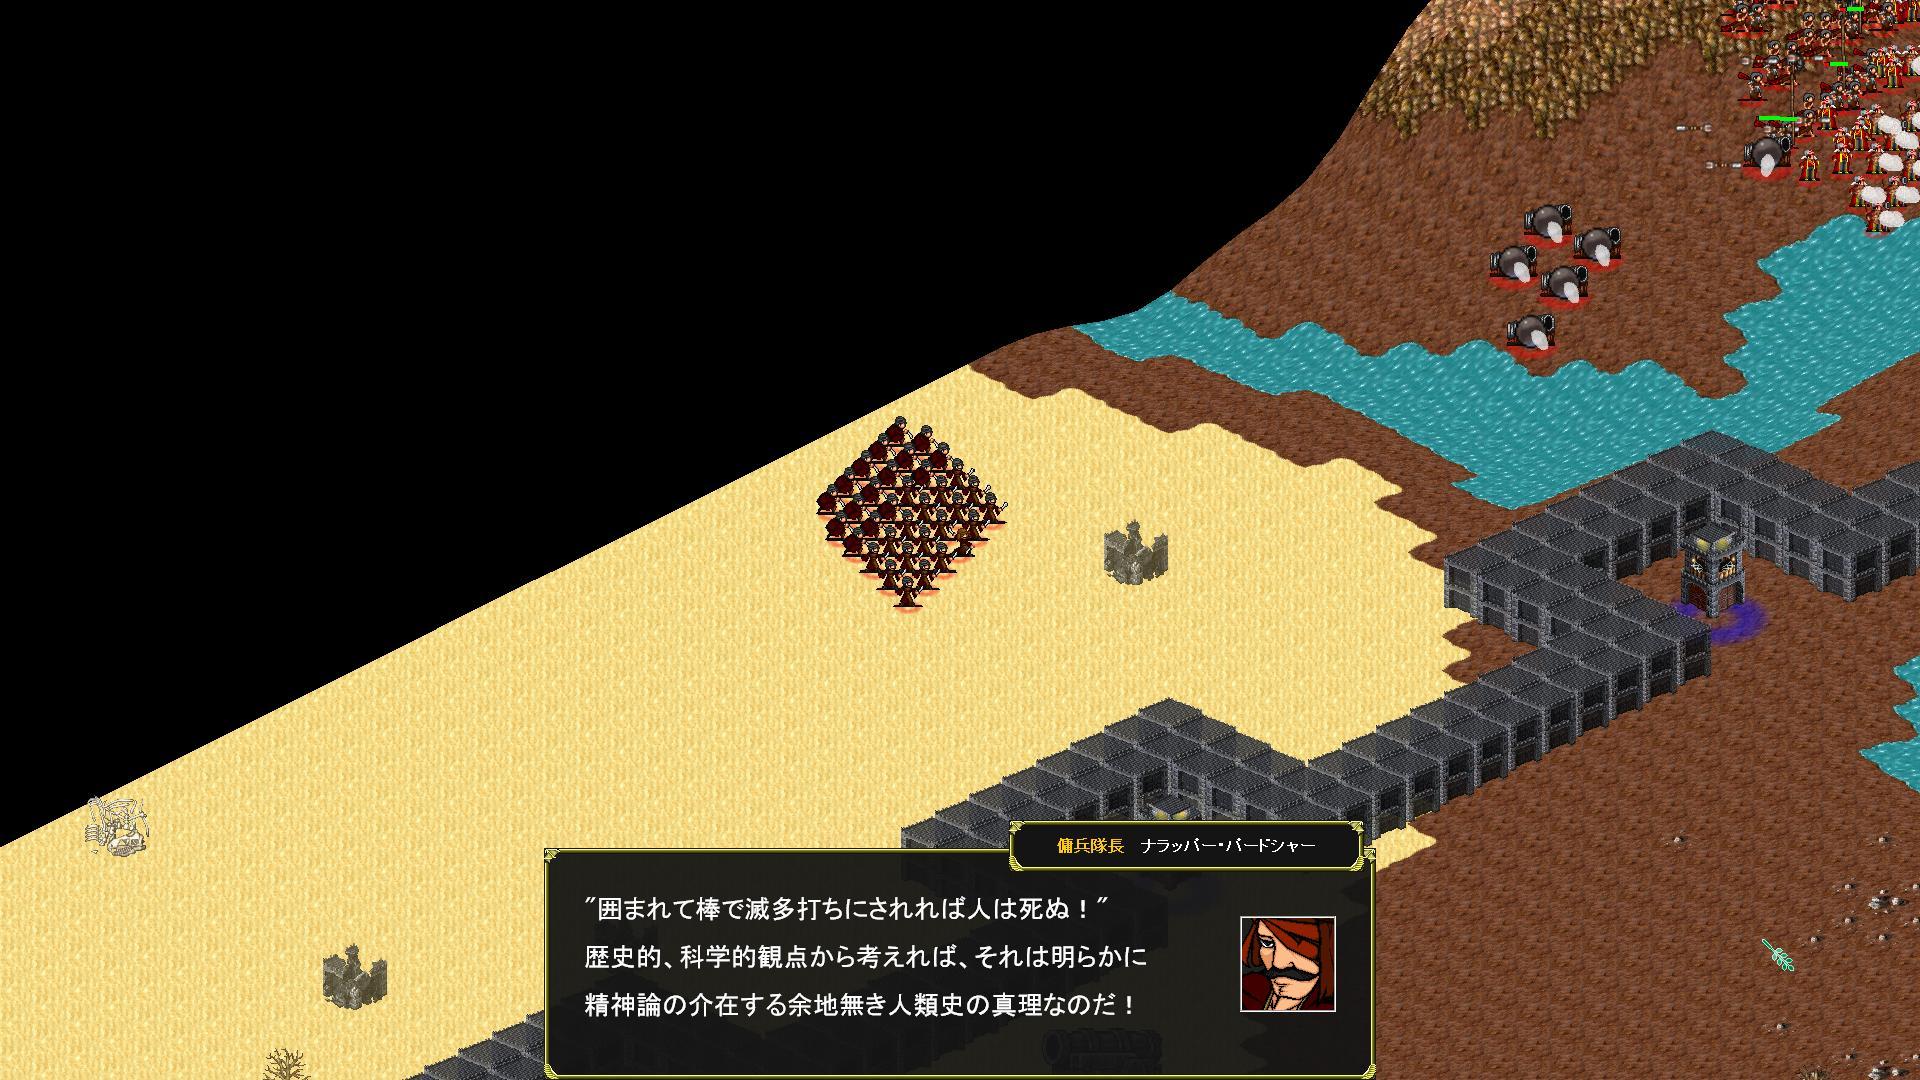 pSn6uK2 - フリーゲーム史上最高傑作のゲーム